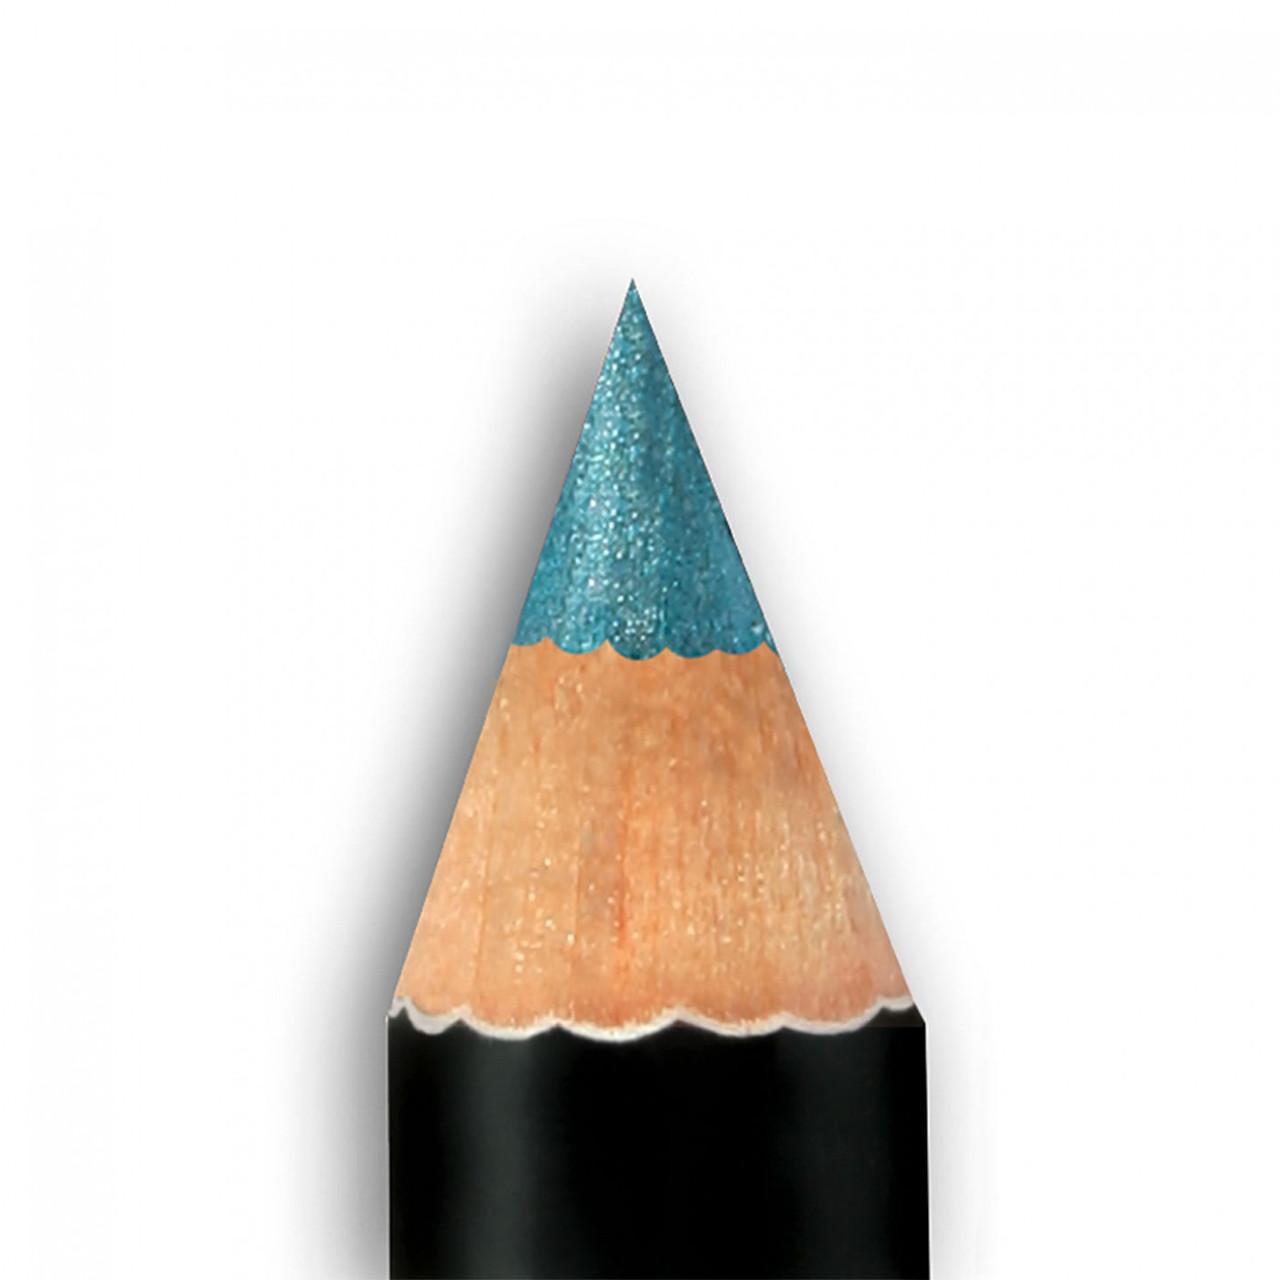 Lorina Олівець 2 в 1 (019 peacock blue)